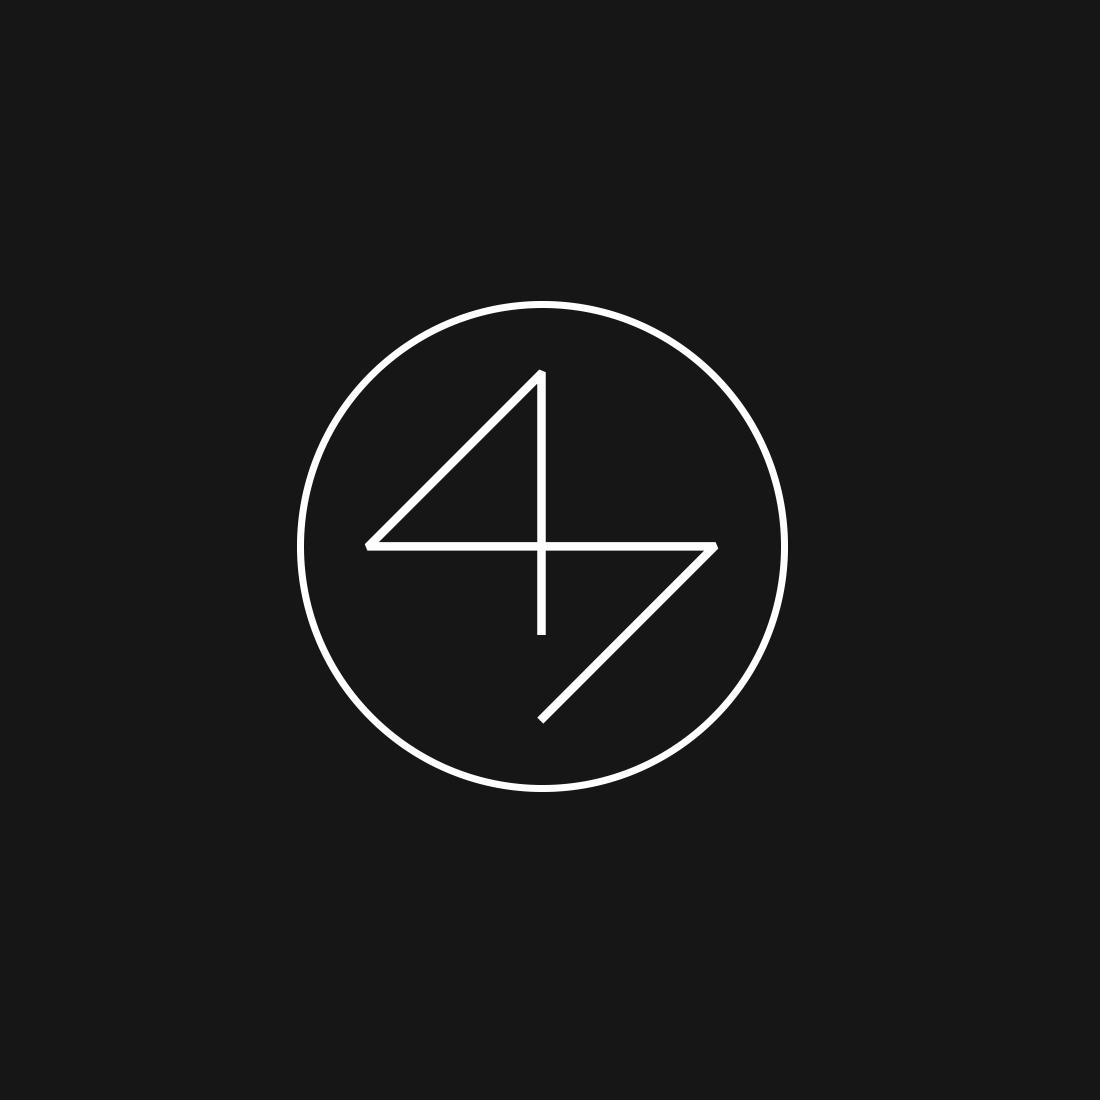 logo_caseArtboard-1-copy-19